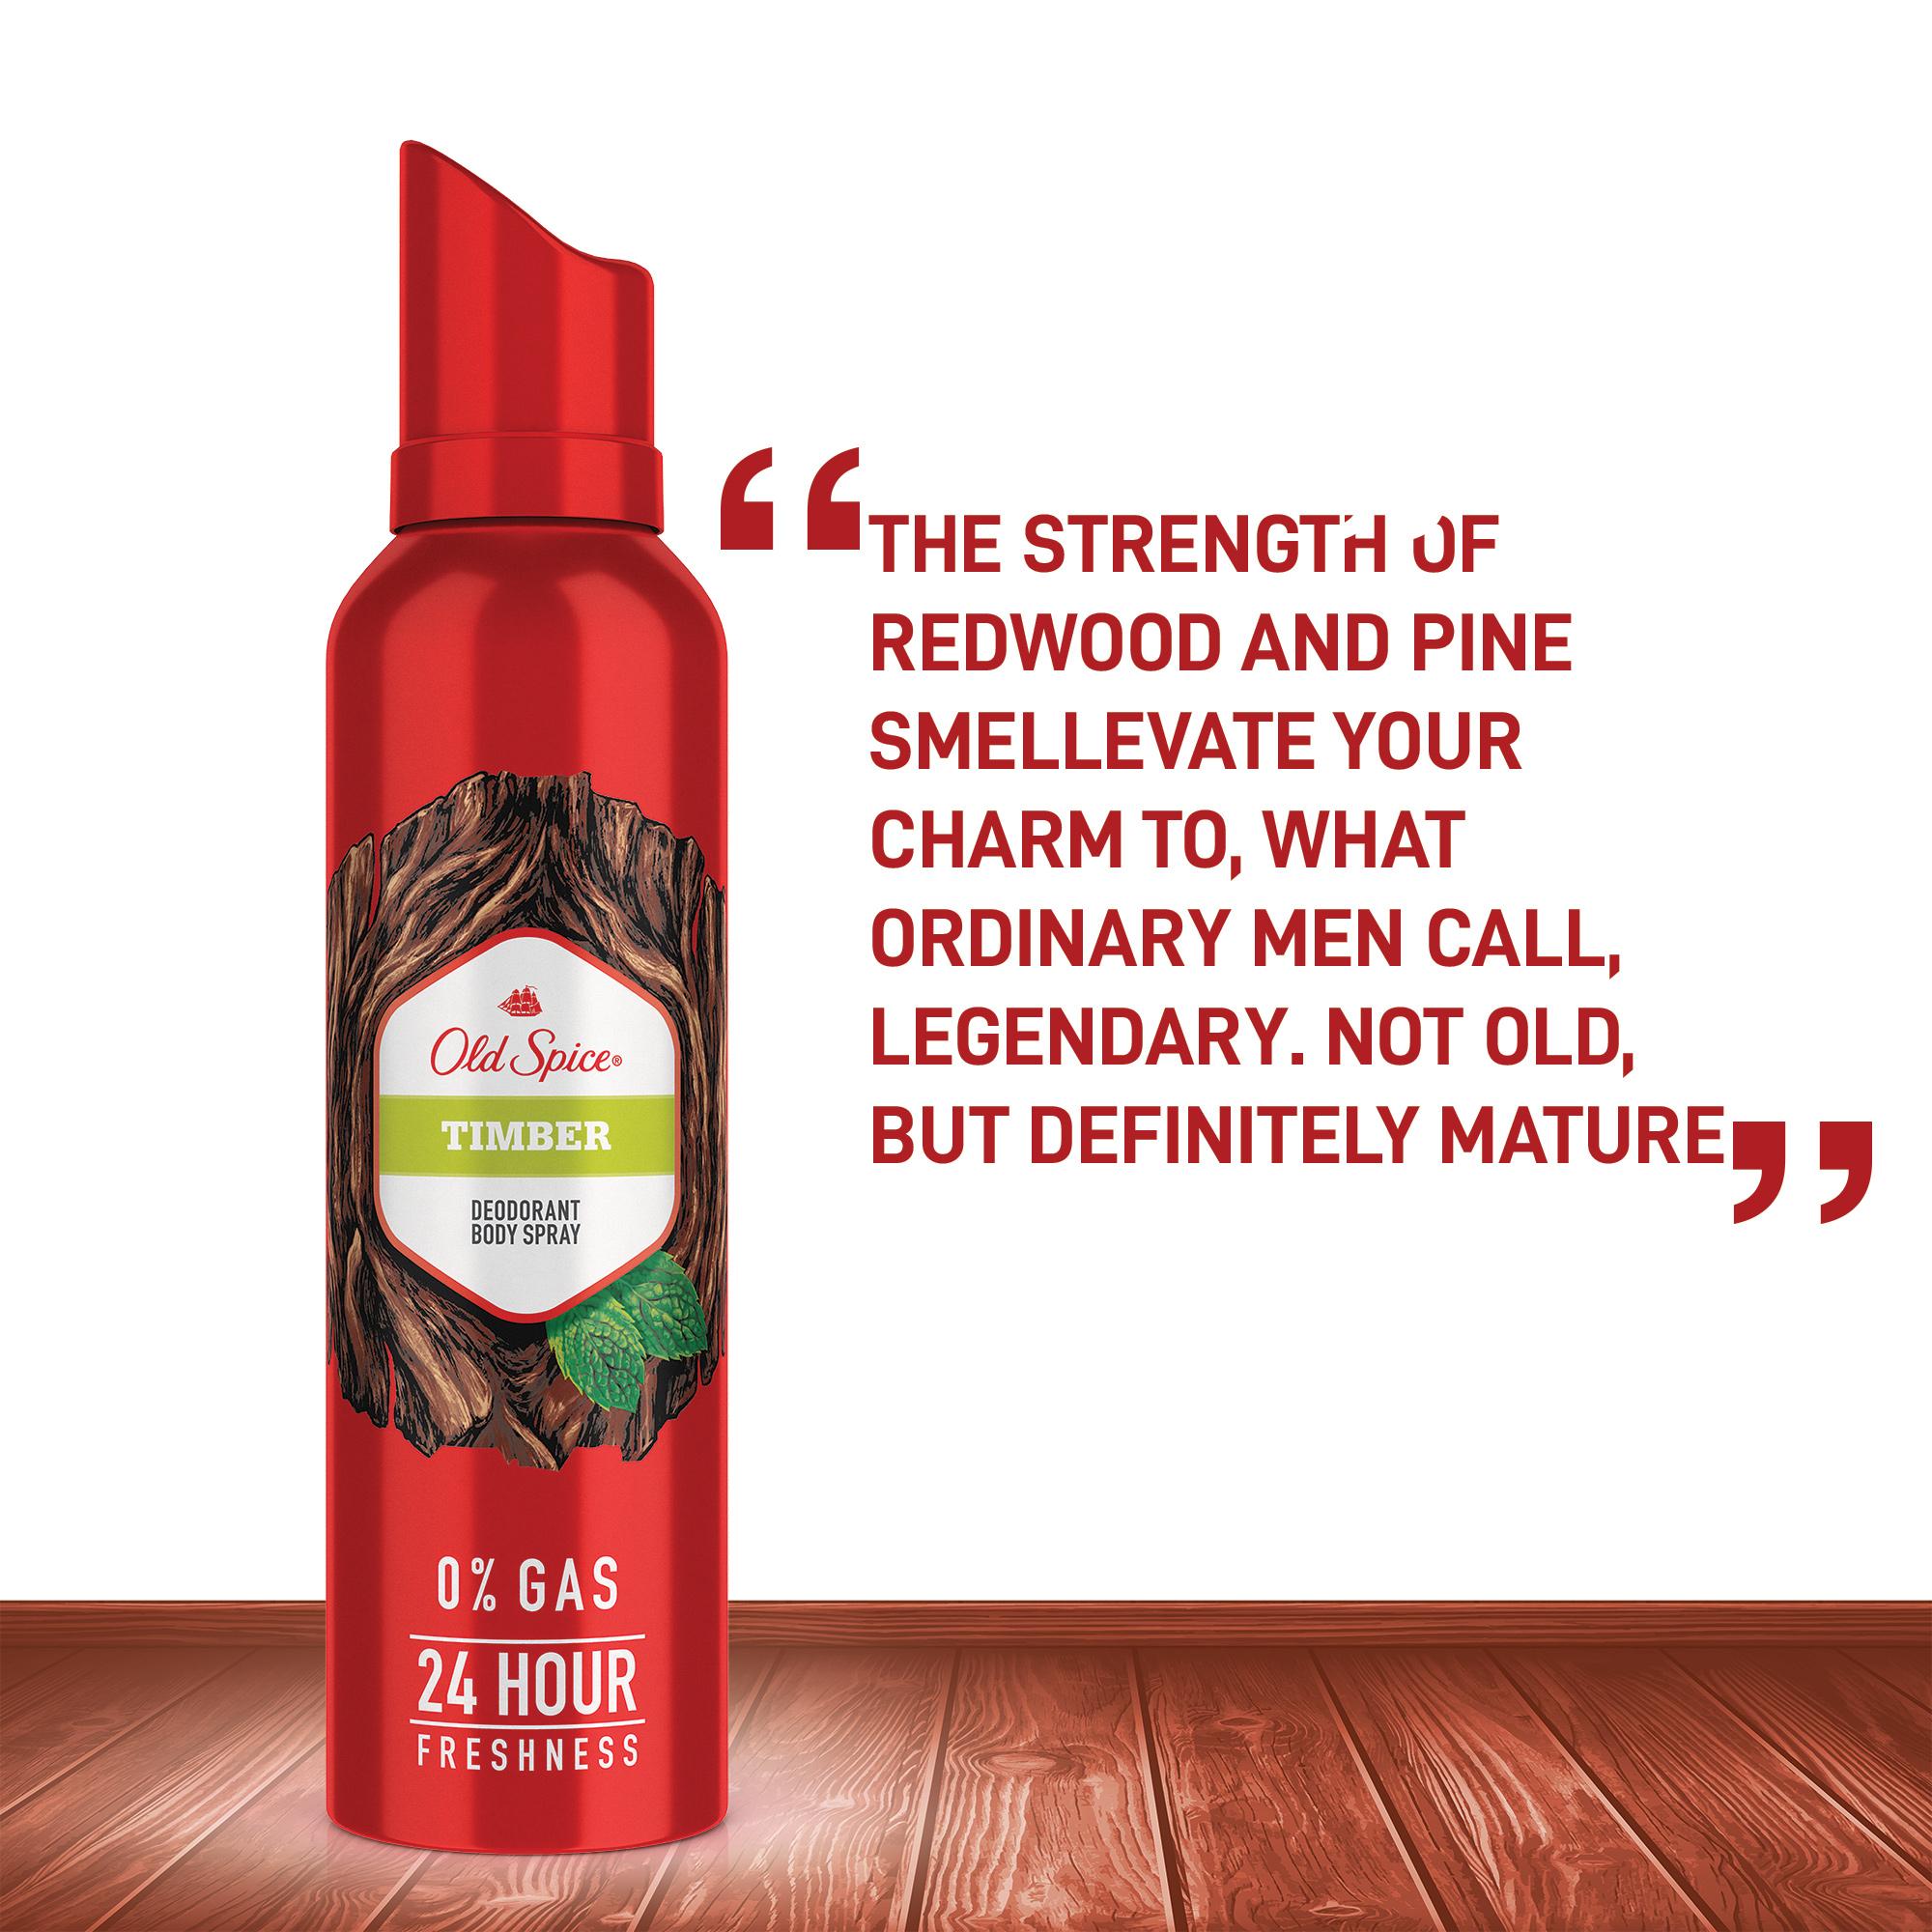 Old Spice Timber No Gas Deodorant Body Spray Perfume, 140 ml